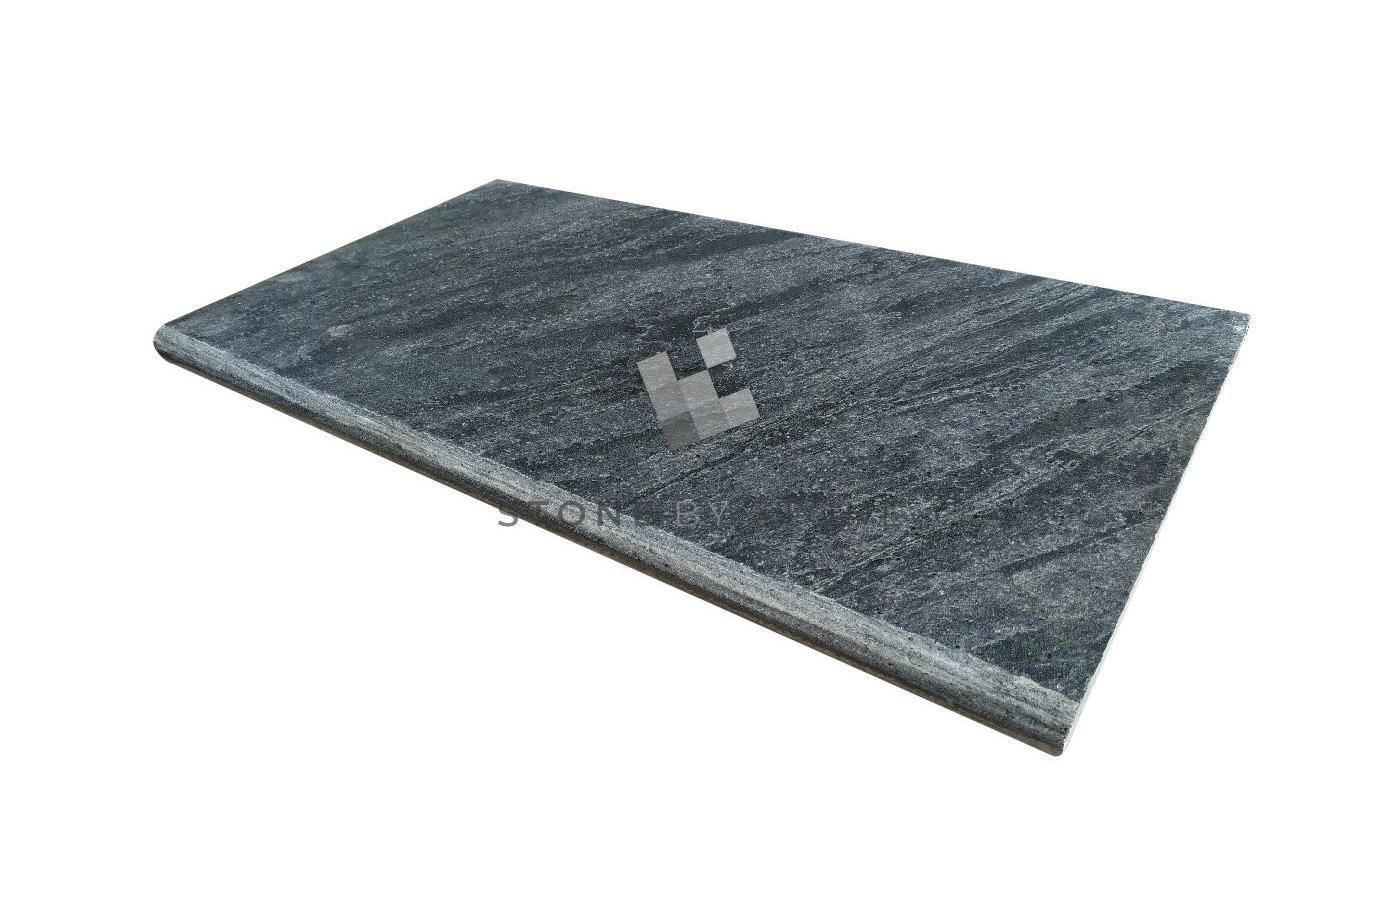 Margelle 33x60/3cm Bord Rond - Pierre d'Asie - Grey Bali